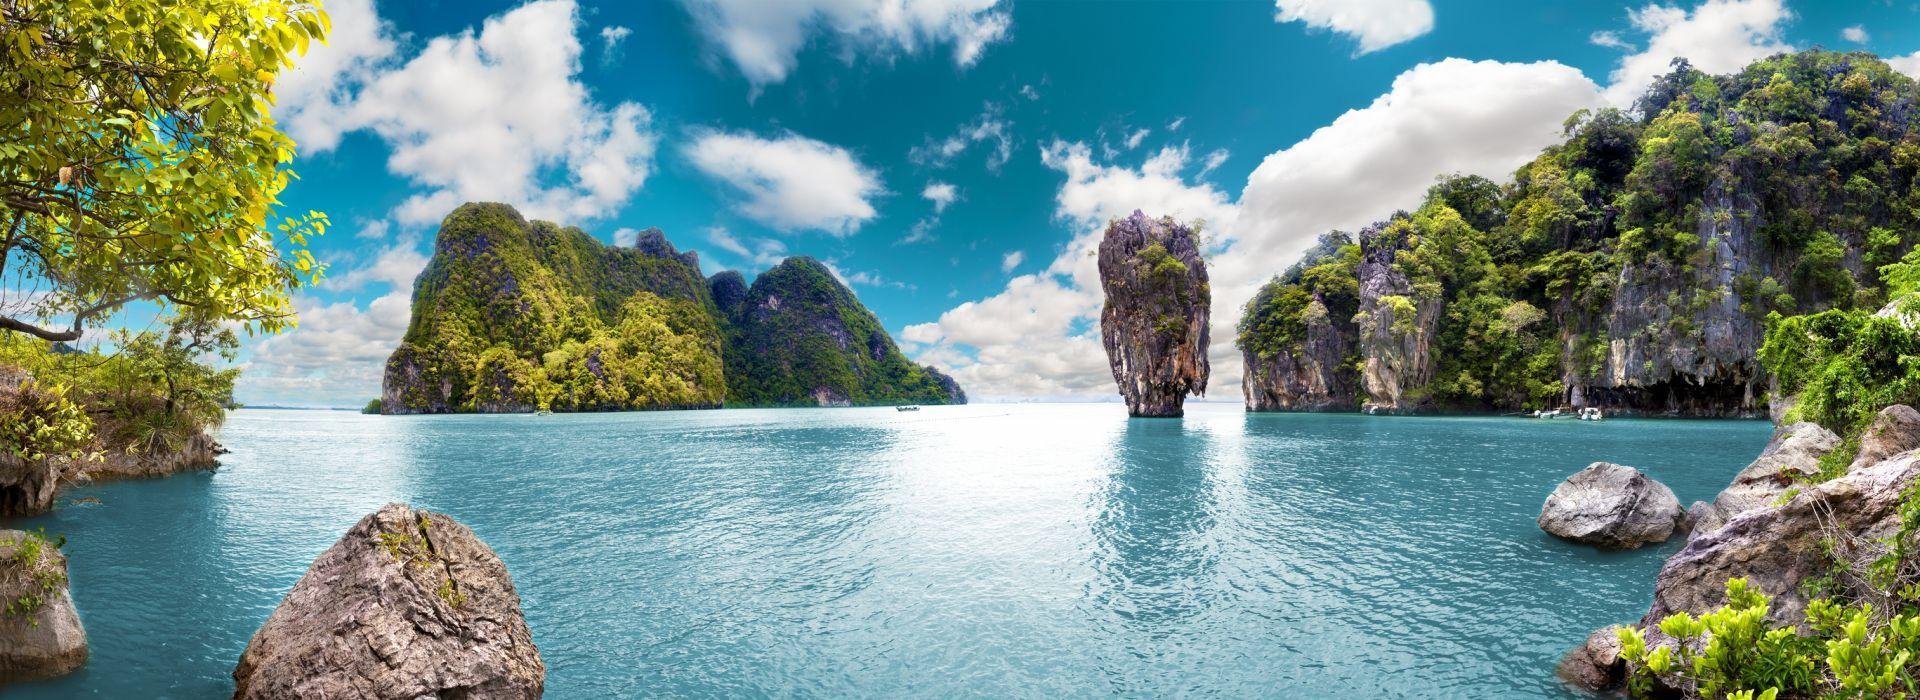 Explorer Tours in Thailand